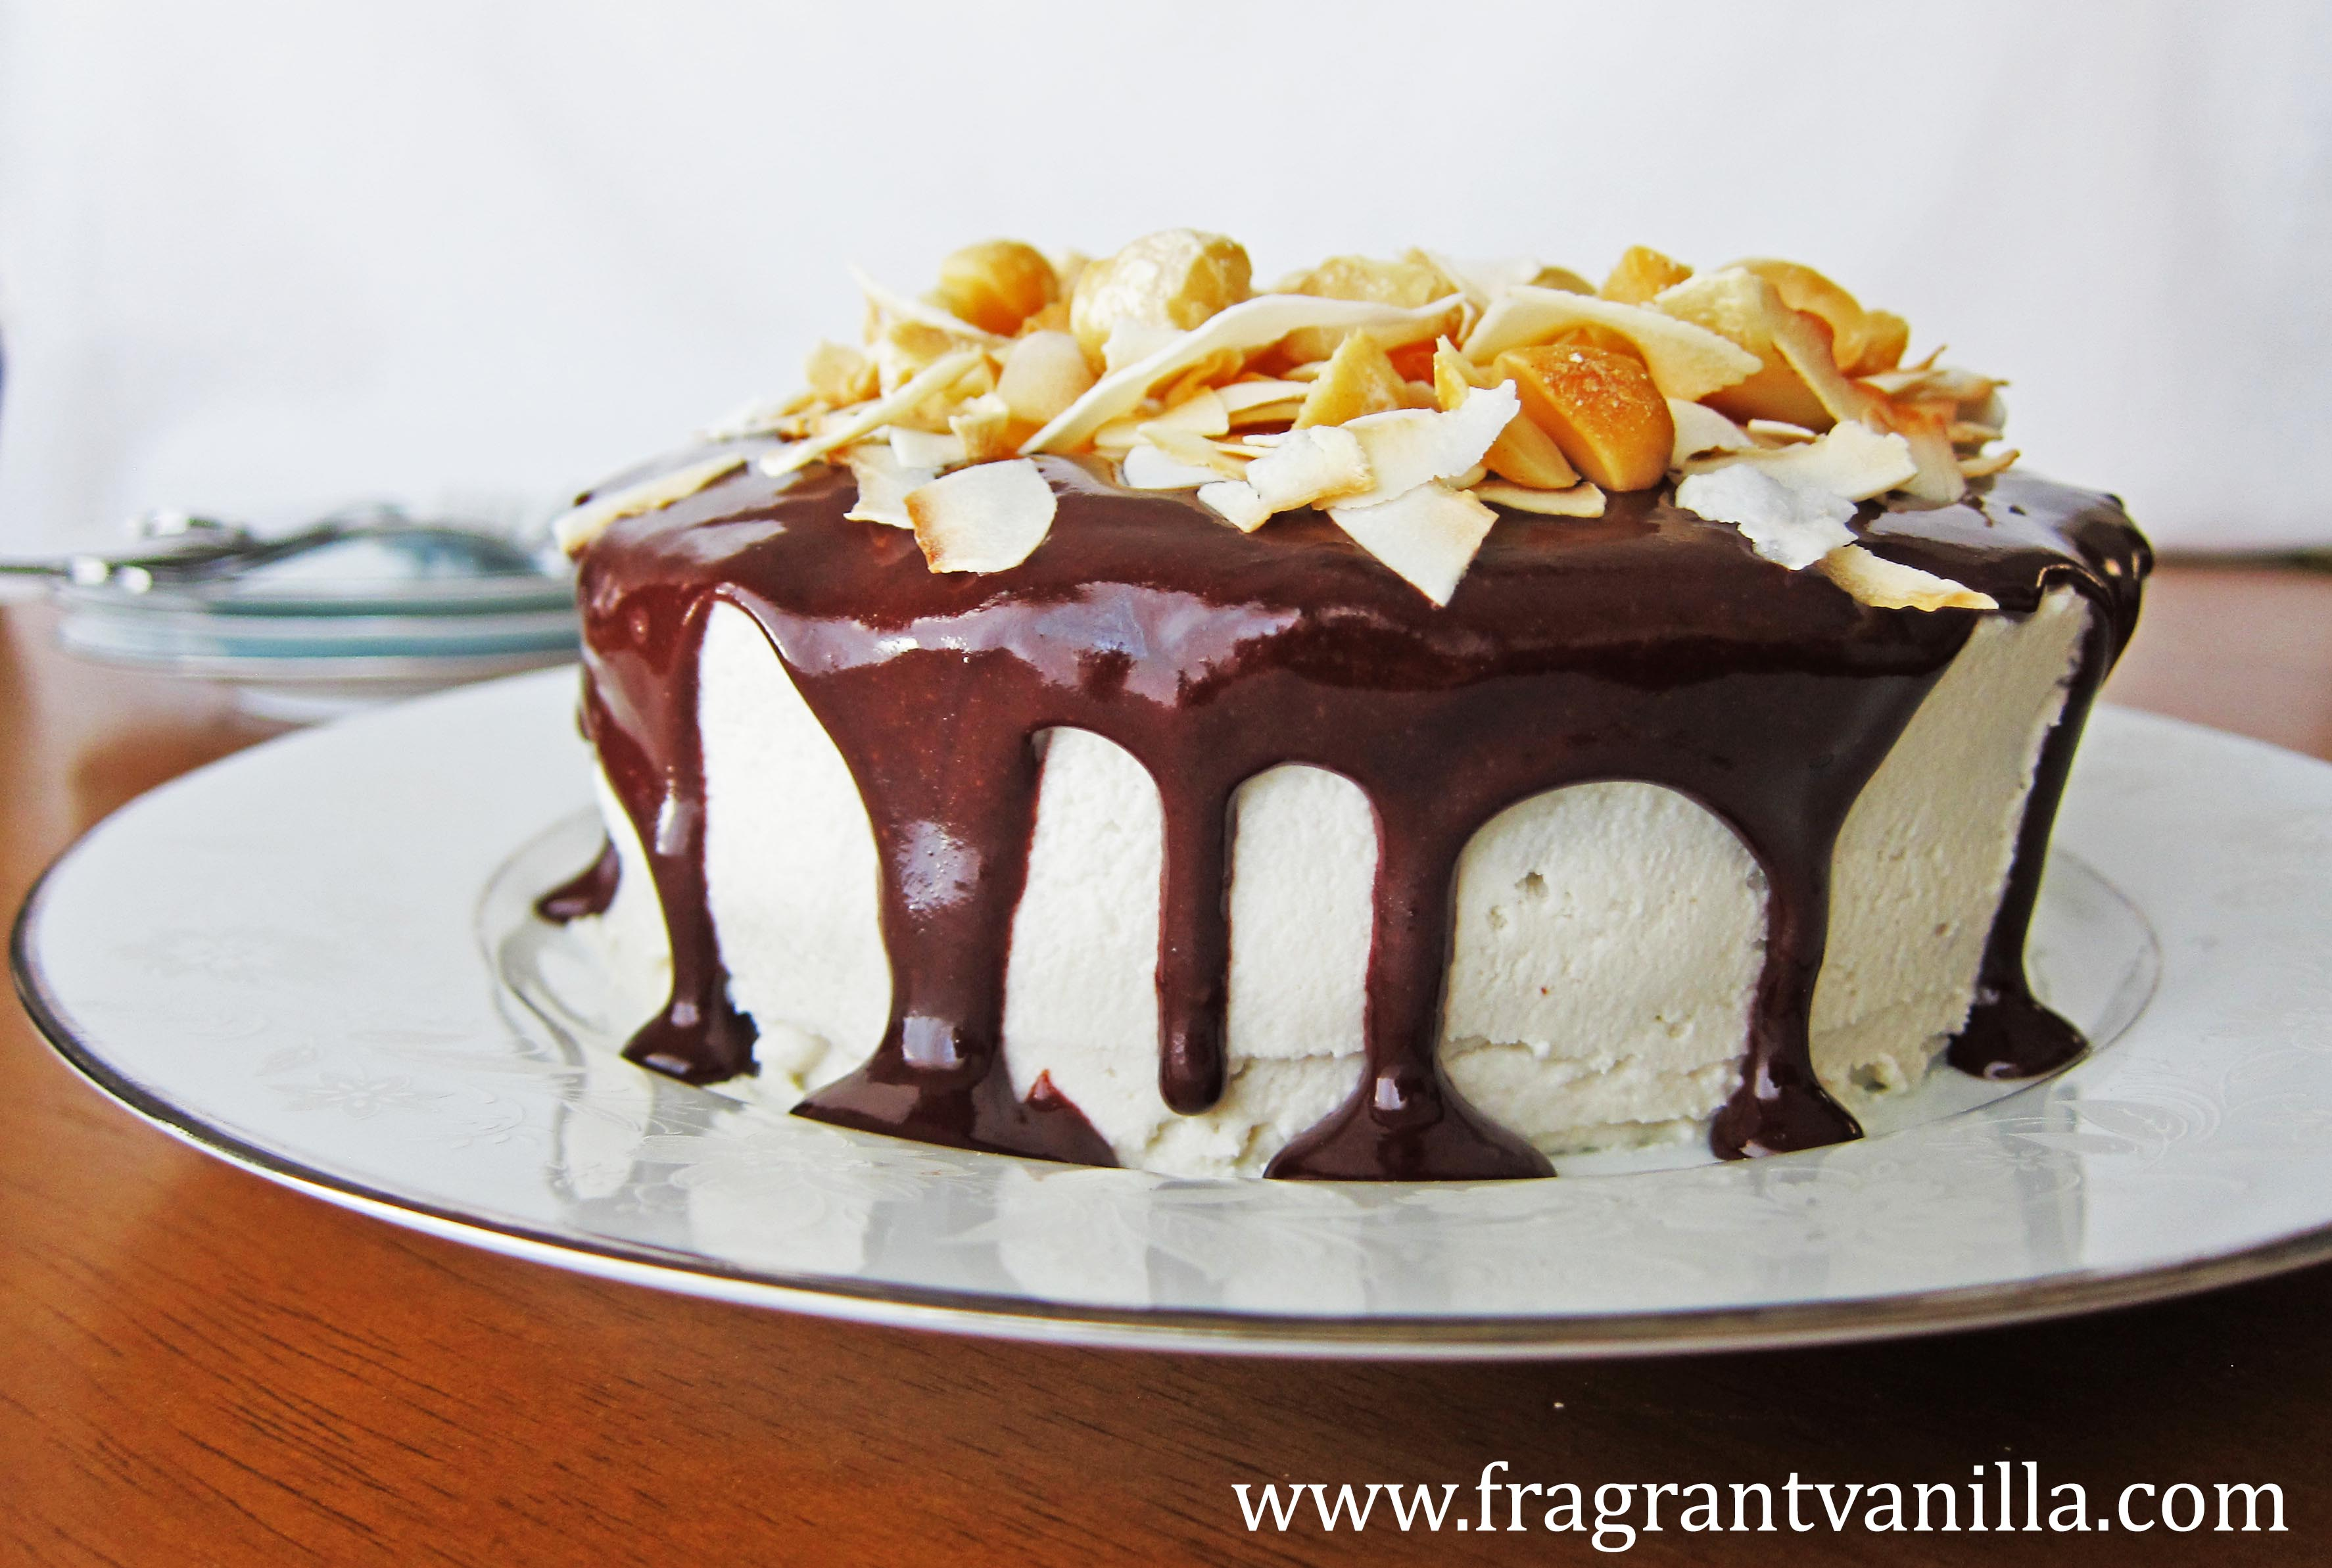 VeganDark Chocolate Coconut Macadamia Cake